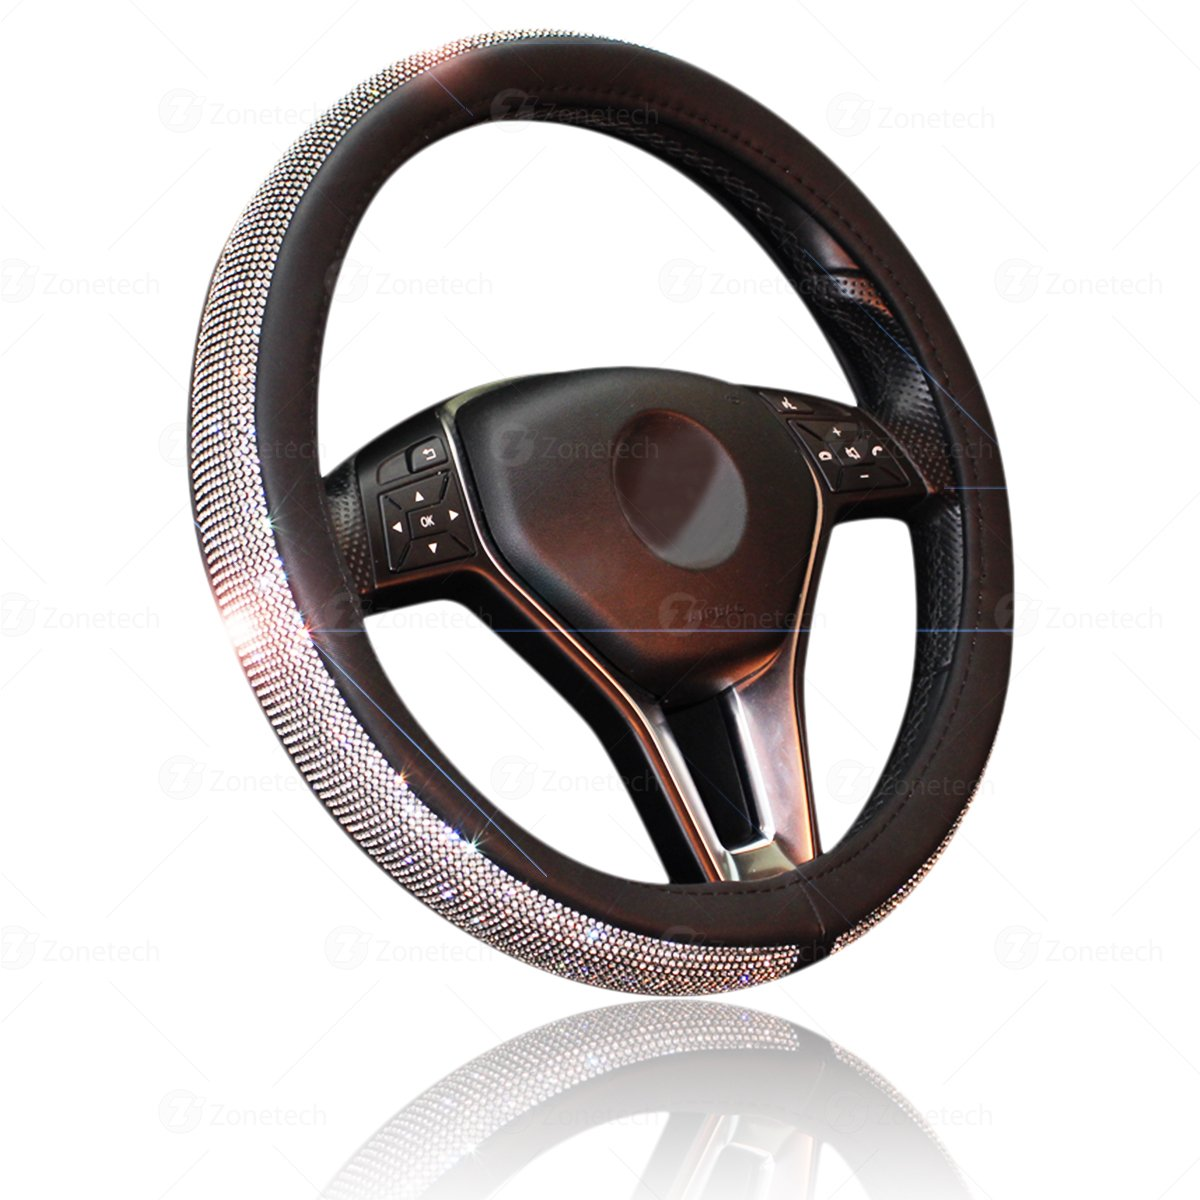 Car Crystal Bling Wheel Cover- Zone Tech Shiny Steering Wheels- Anti-Slip Rhinestones PU Leather Backing- Bling Shiny Diamond Wheel Protector Comfort Wheels